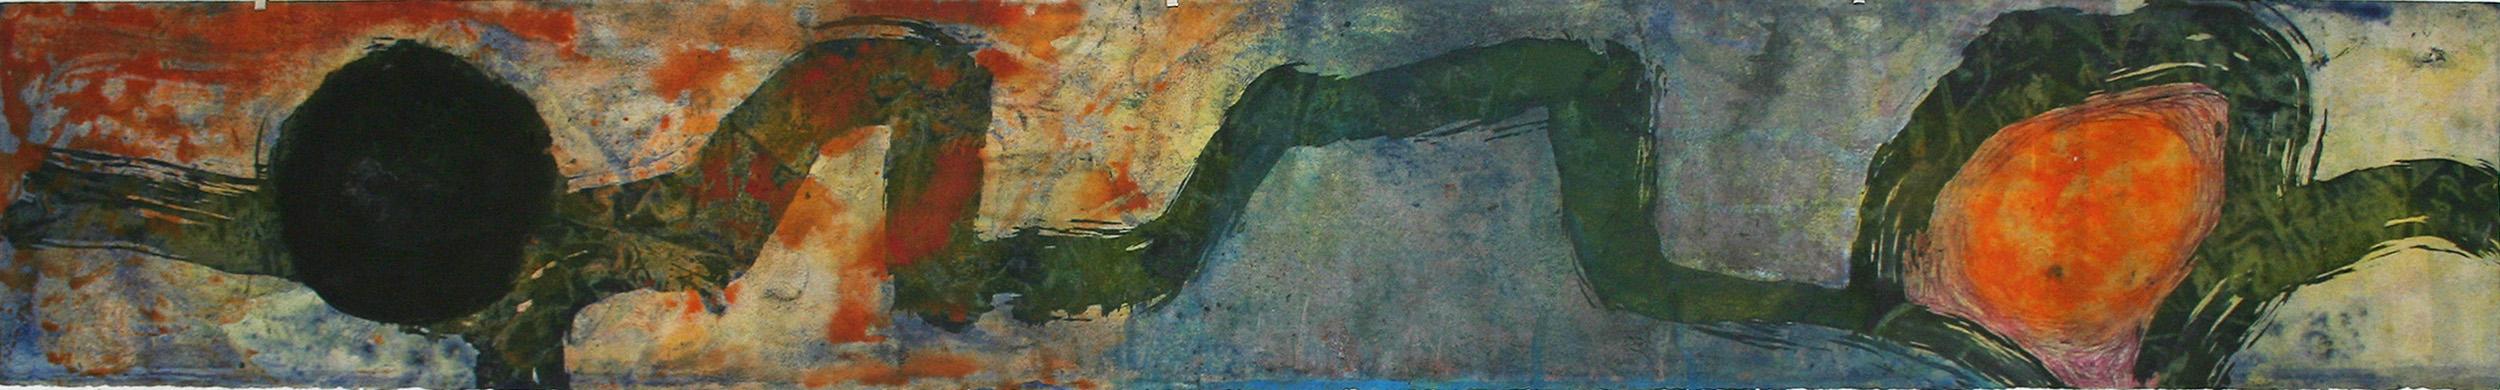 Sense títol  , pintura sobre paper Velin Arches, 198 x 28 centímetres. 2008